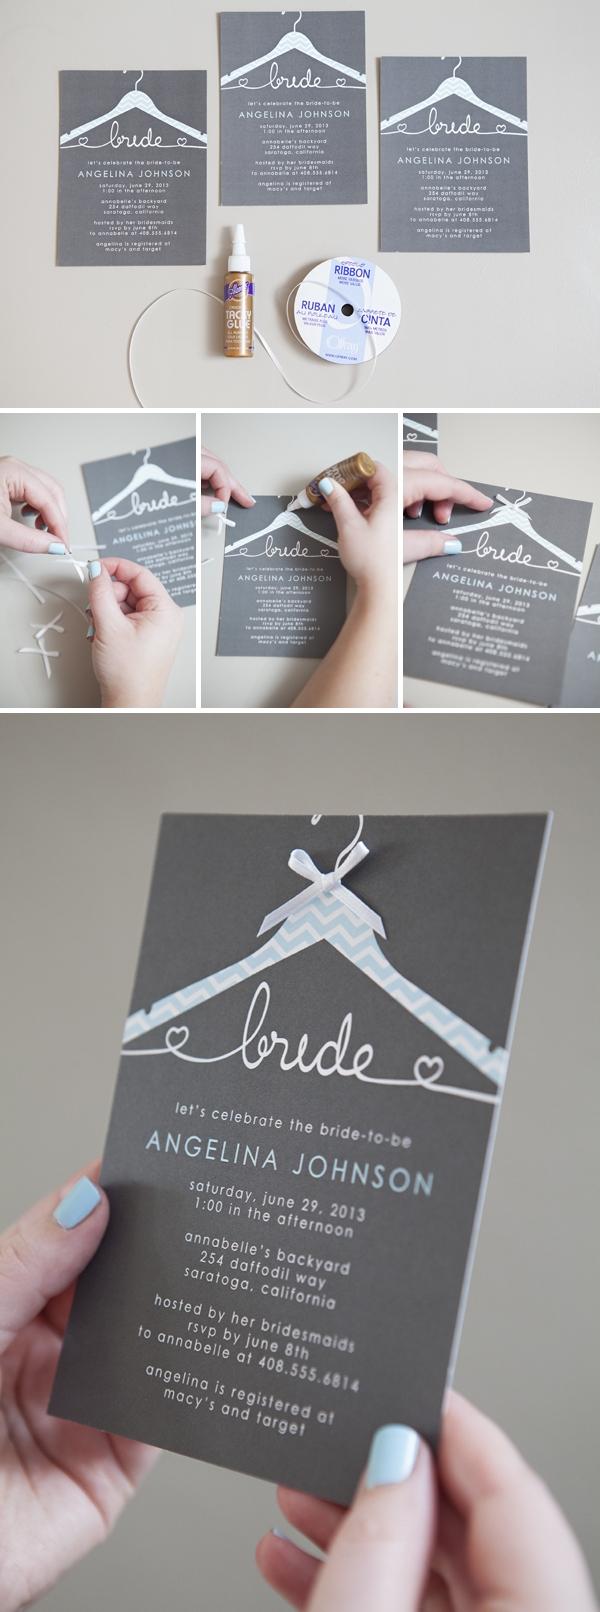 diy invitations wedding paper divas diy wedding invitation ST DIY Wedding Paper Divas DIY wedding invitations